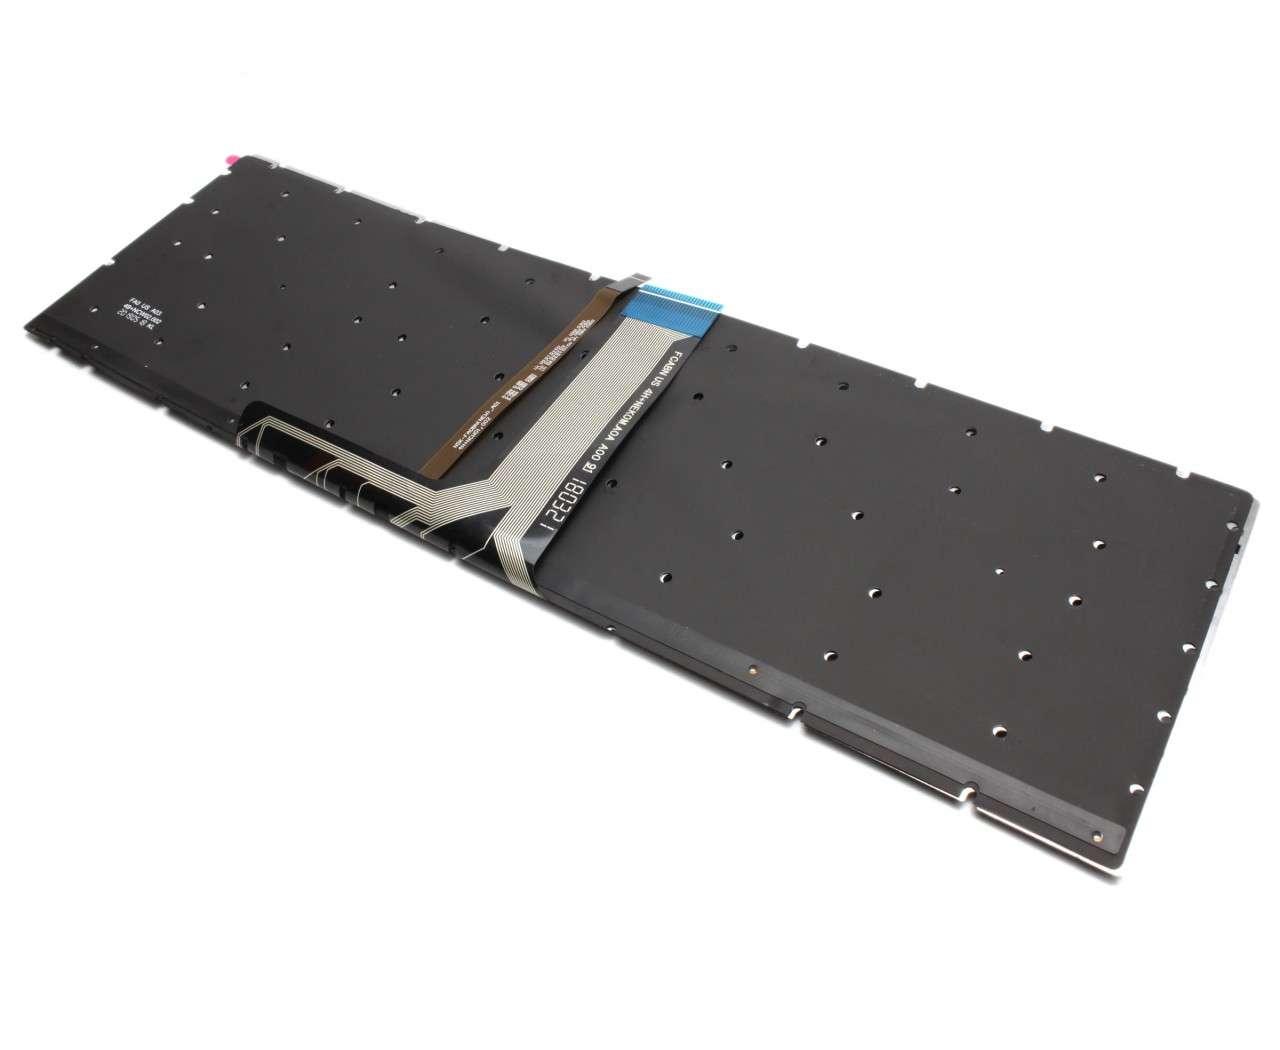 Tastatura MSI NSK-FB1BN iluminata layout US fara rama enter mic imagine powerlaptop.ro 2021